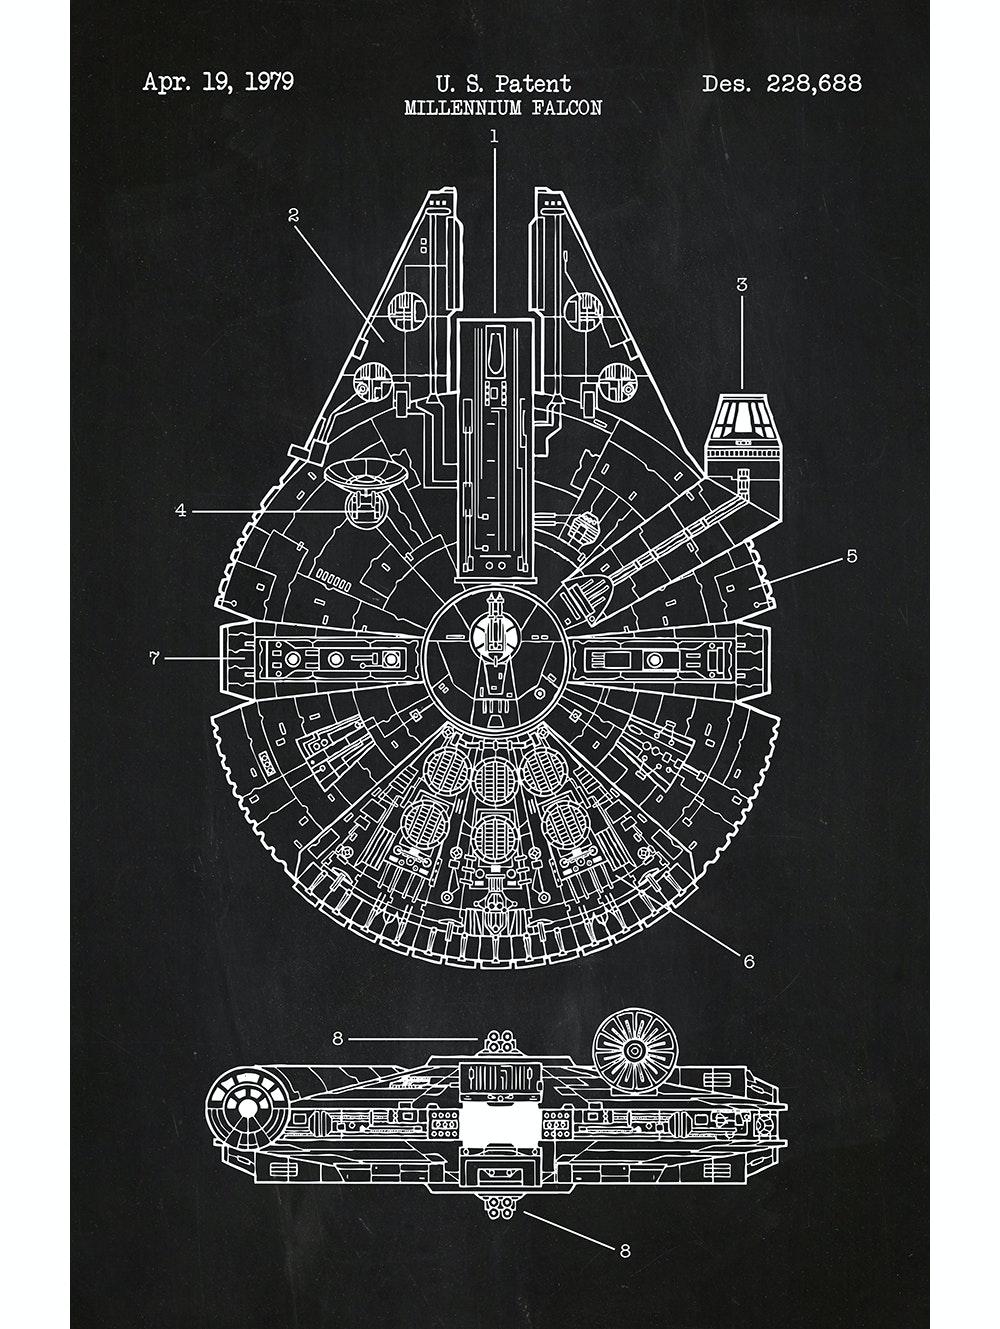 Star Wars - Millennium Falcon Patent - 228,688